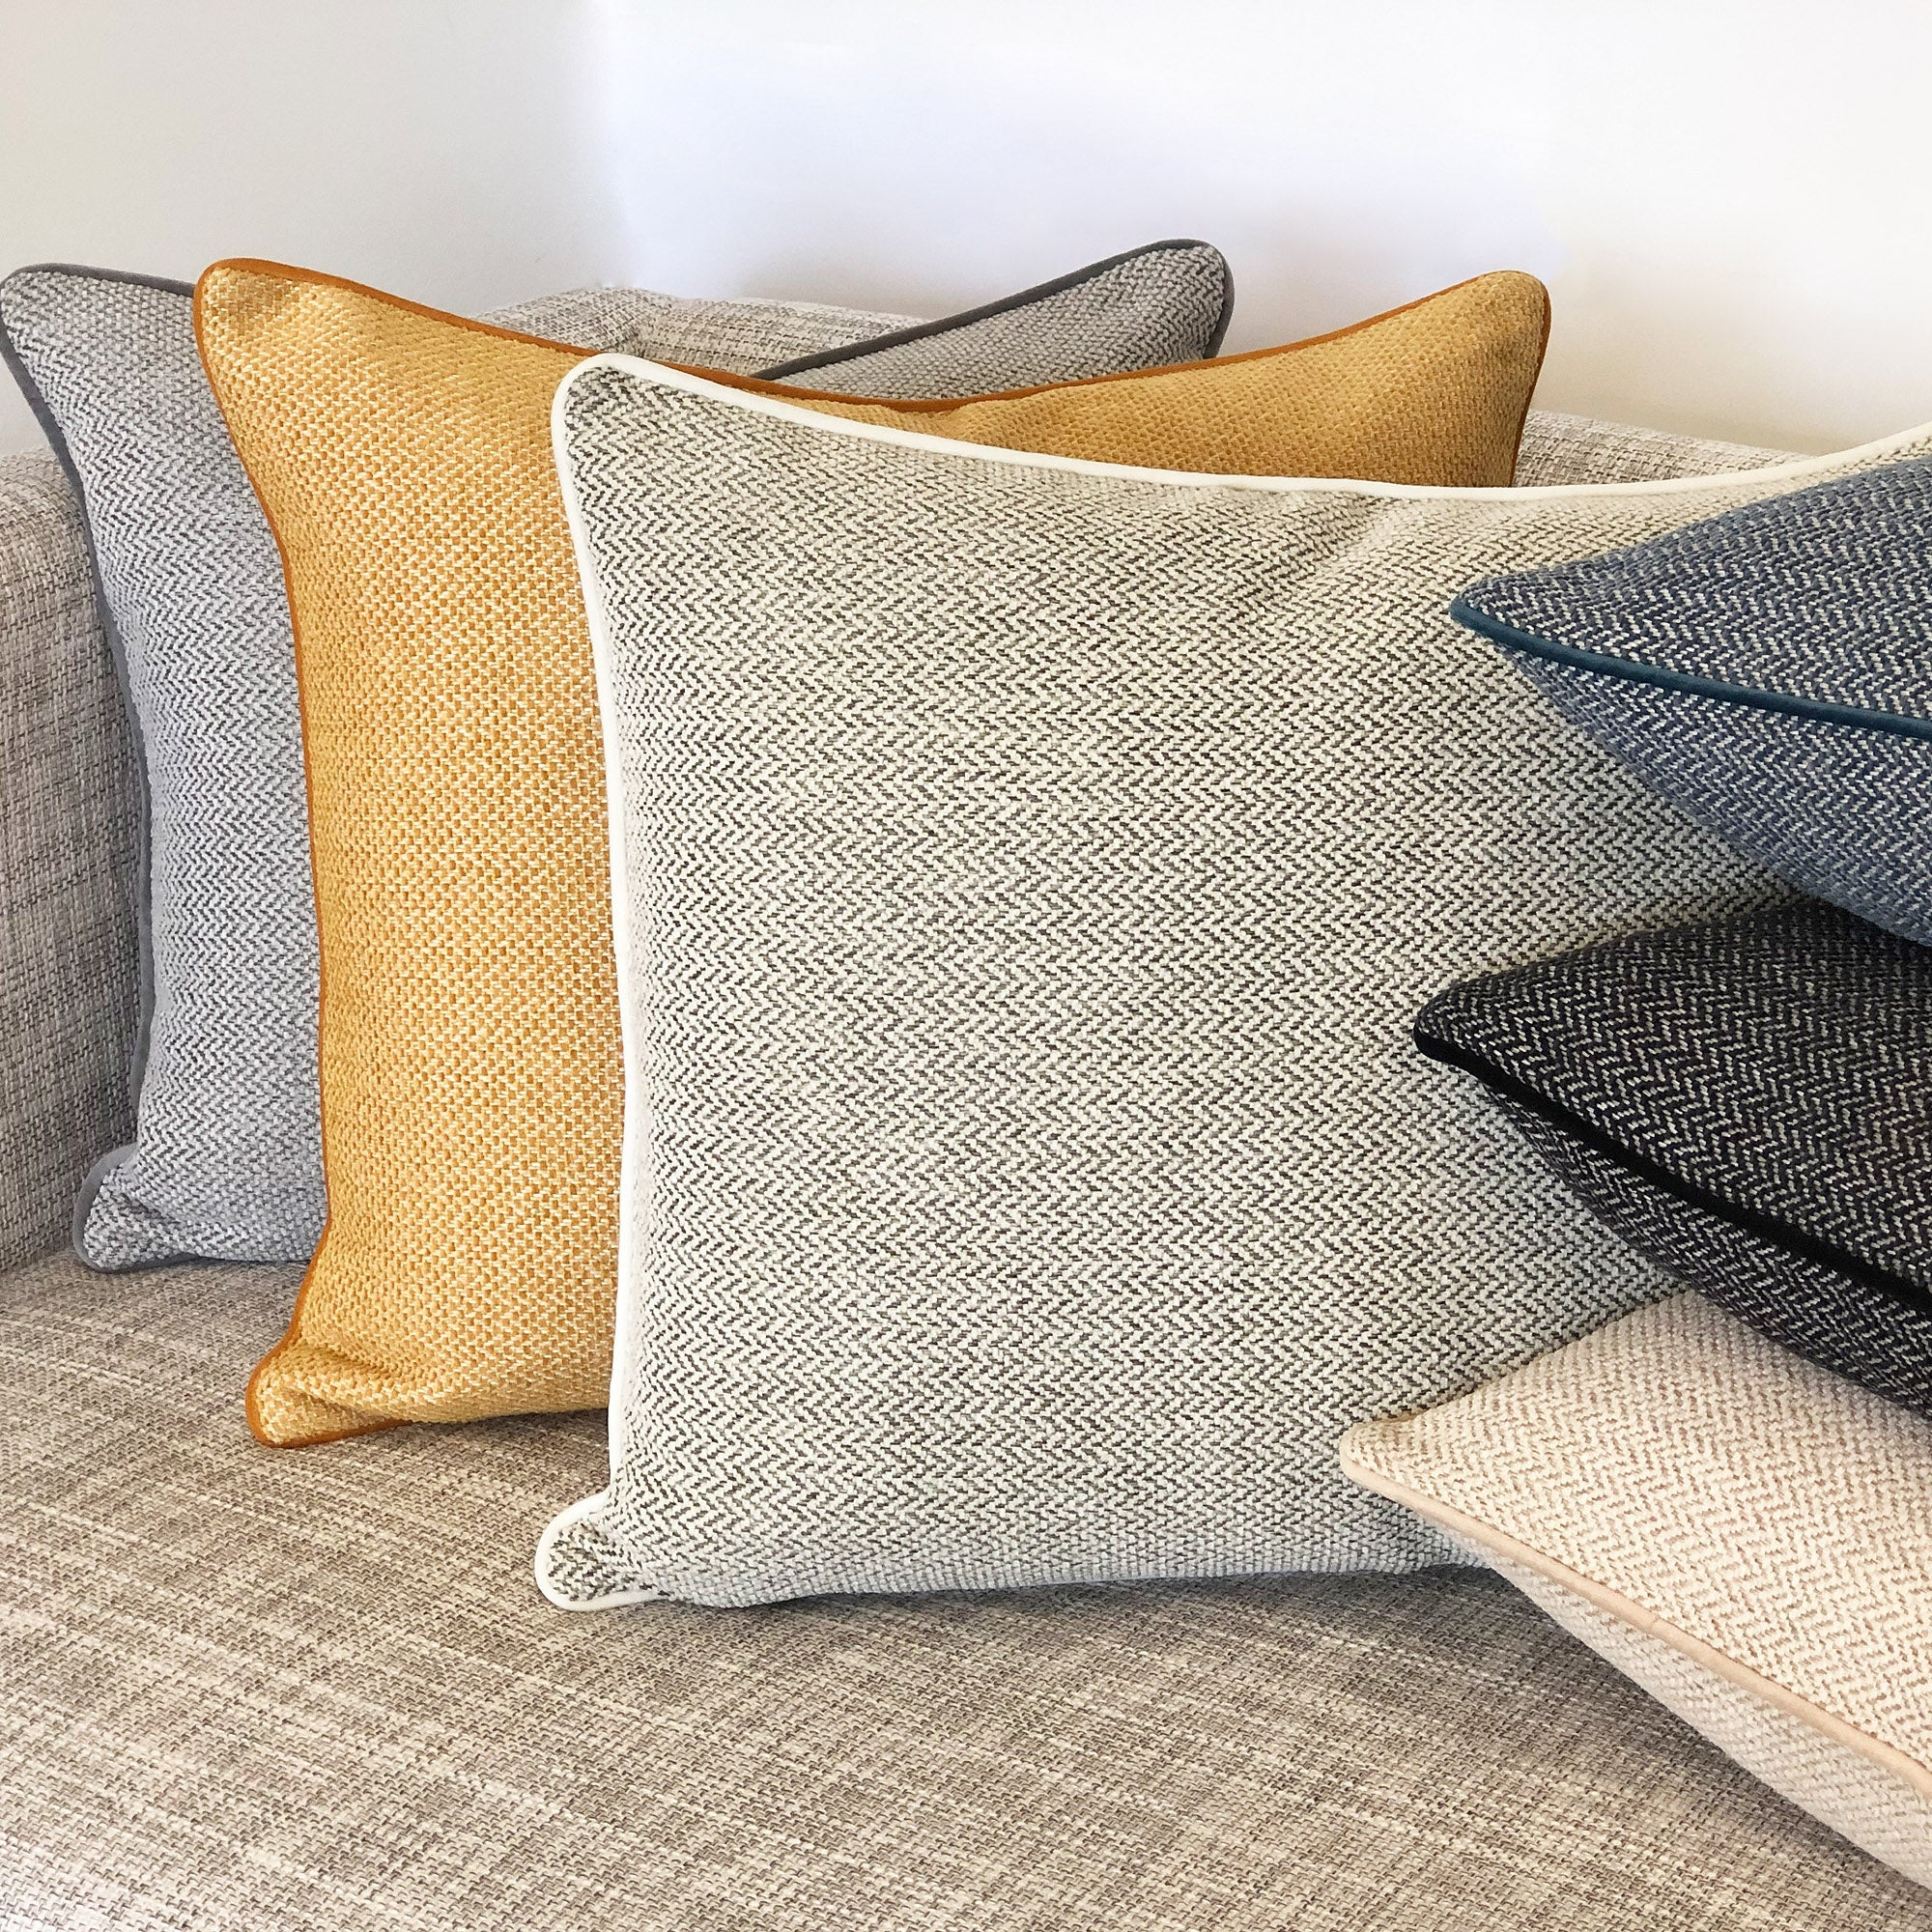 Rodeo Home Zena Modern Minimalist Rectangular Throw Pillow Overstock 31568254